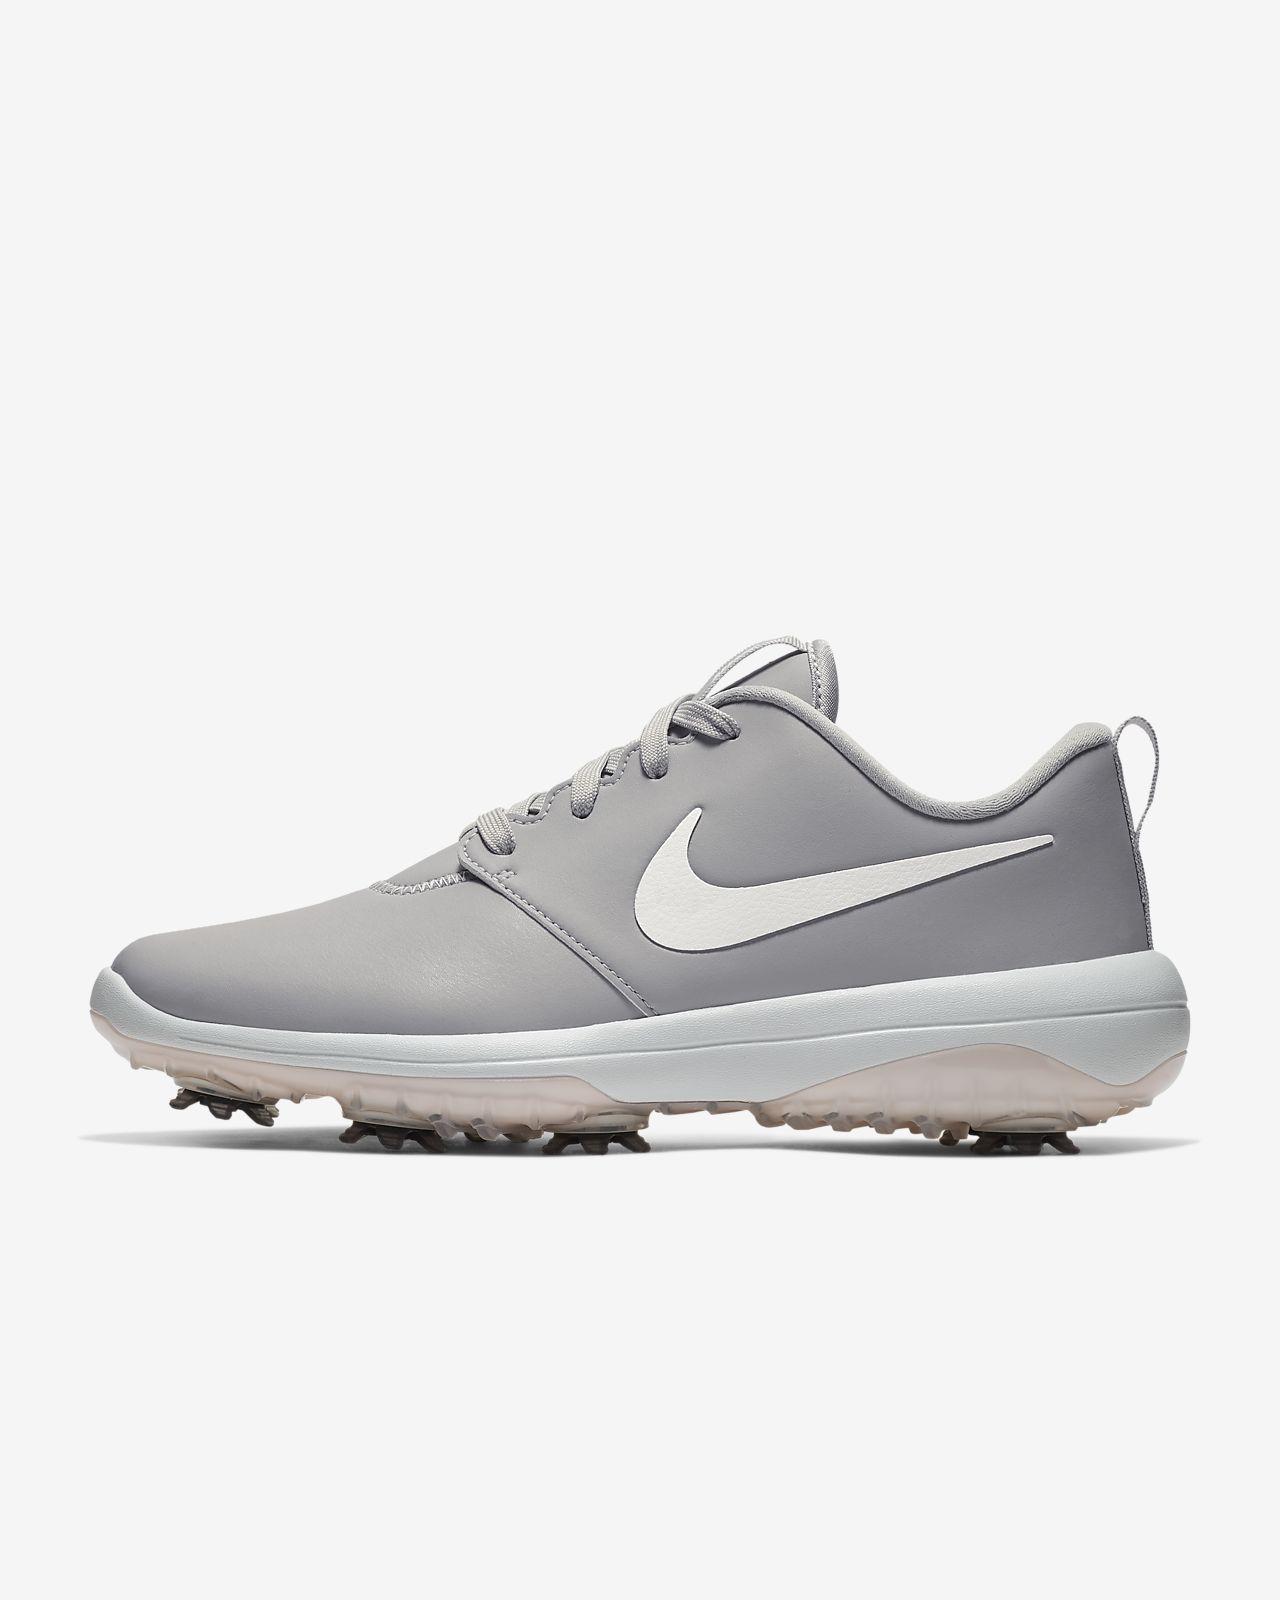 Chaussure de golf Nike Roshe G Tour pour Femme